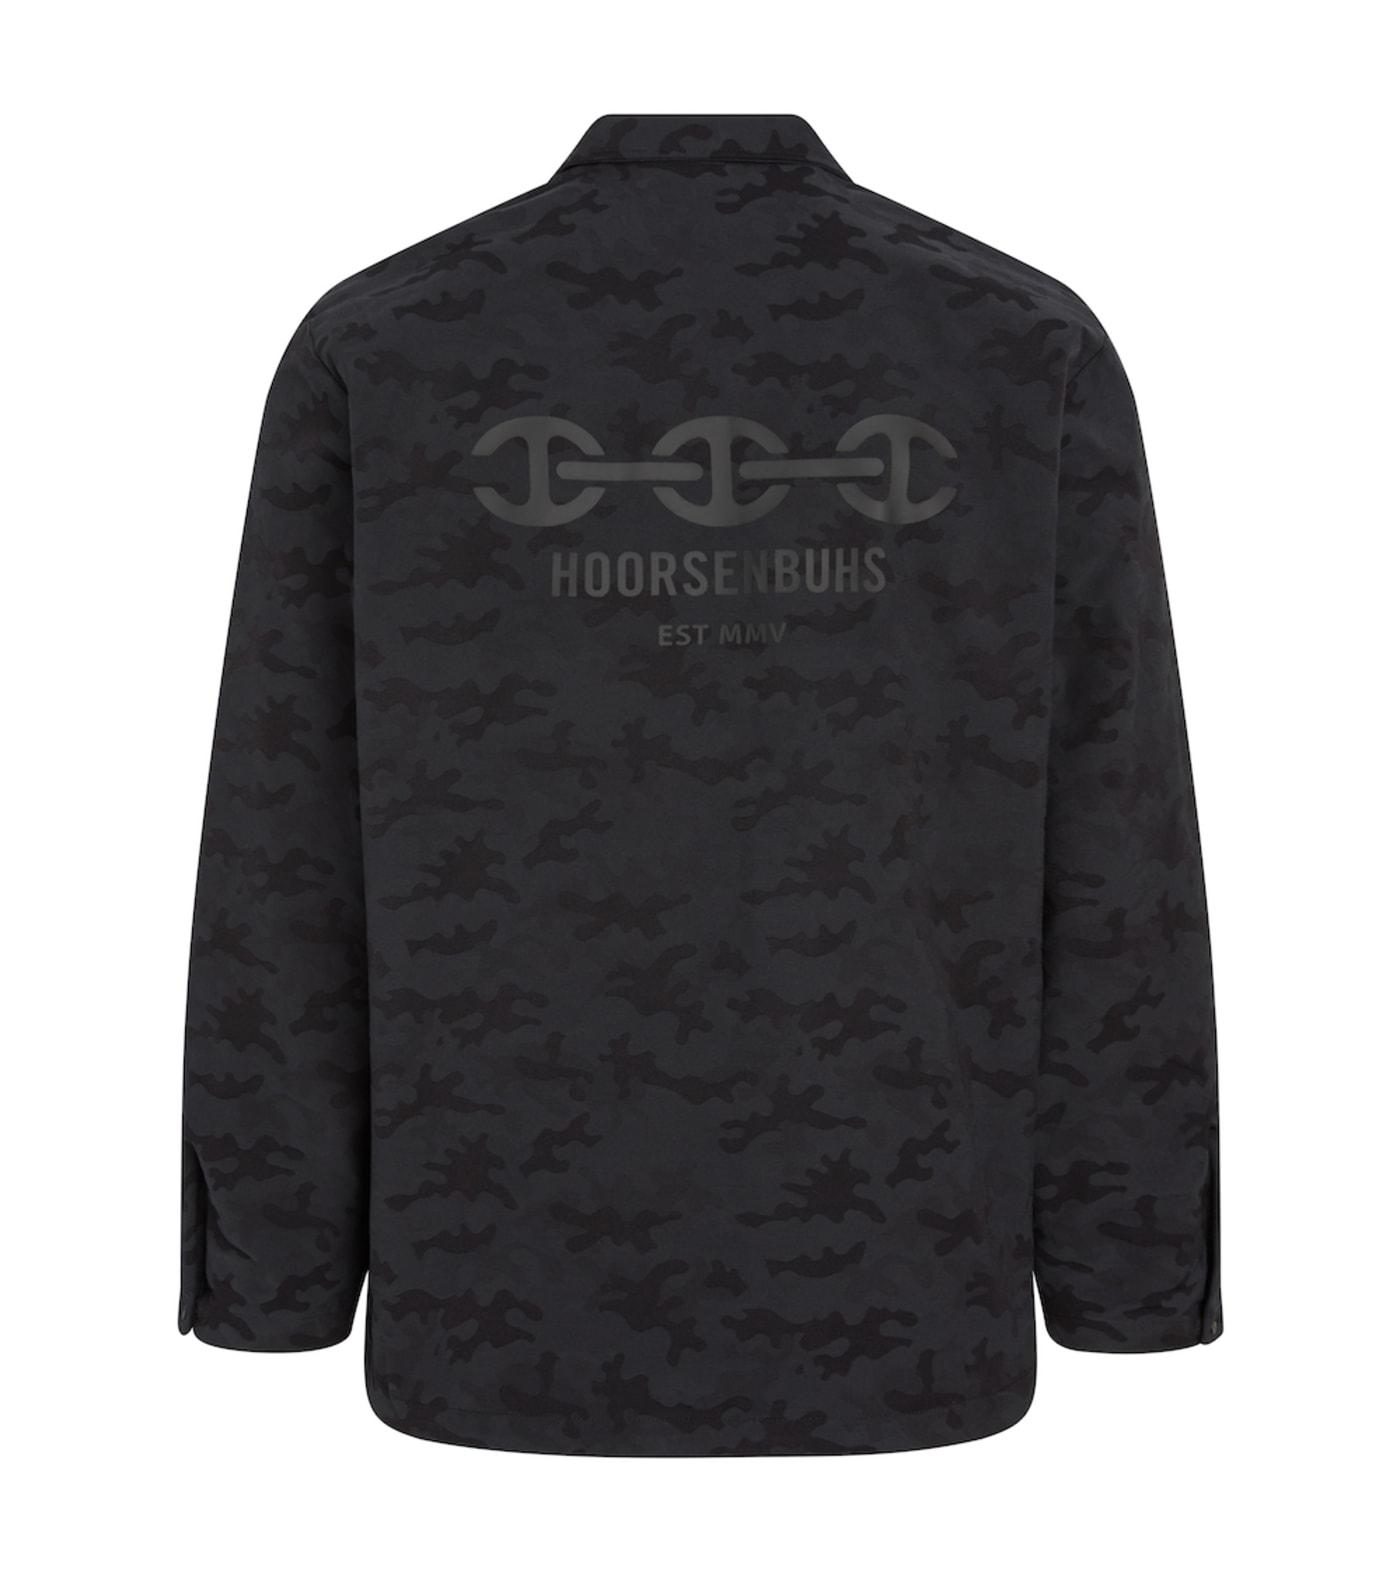 Hoorsenbuhs Complex Best Style REleases